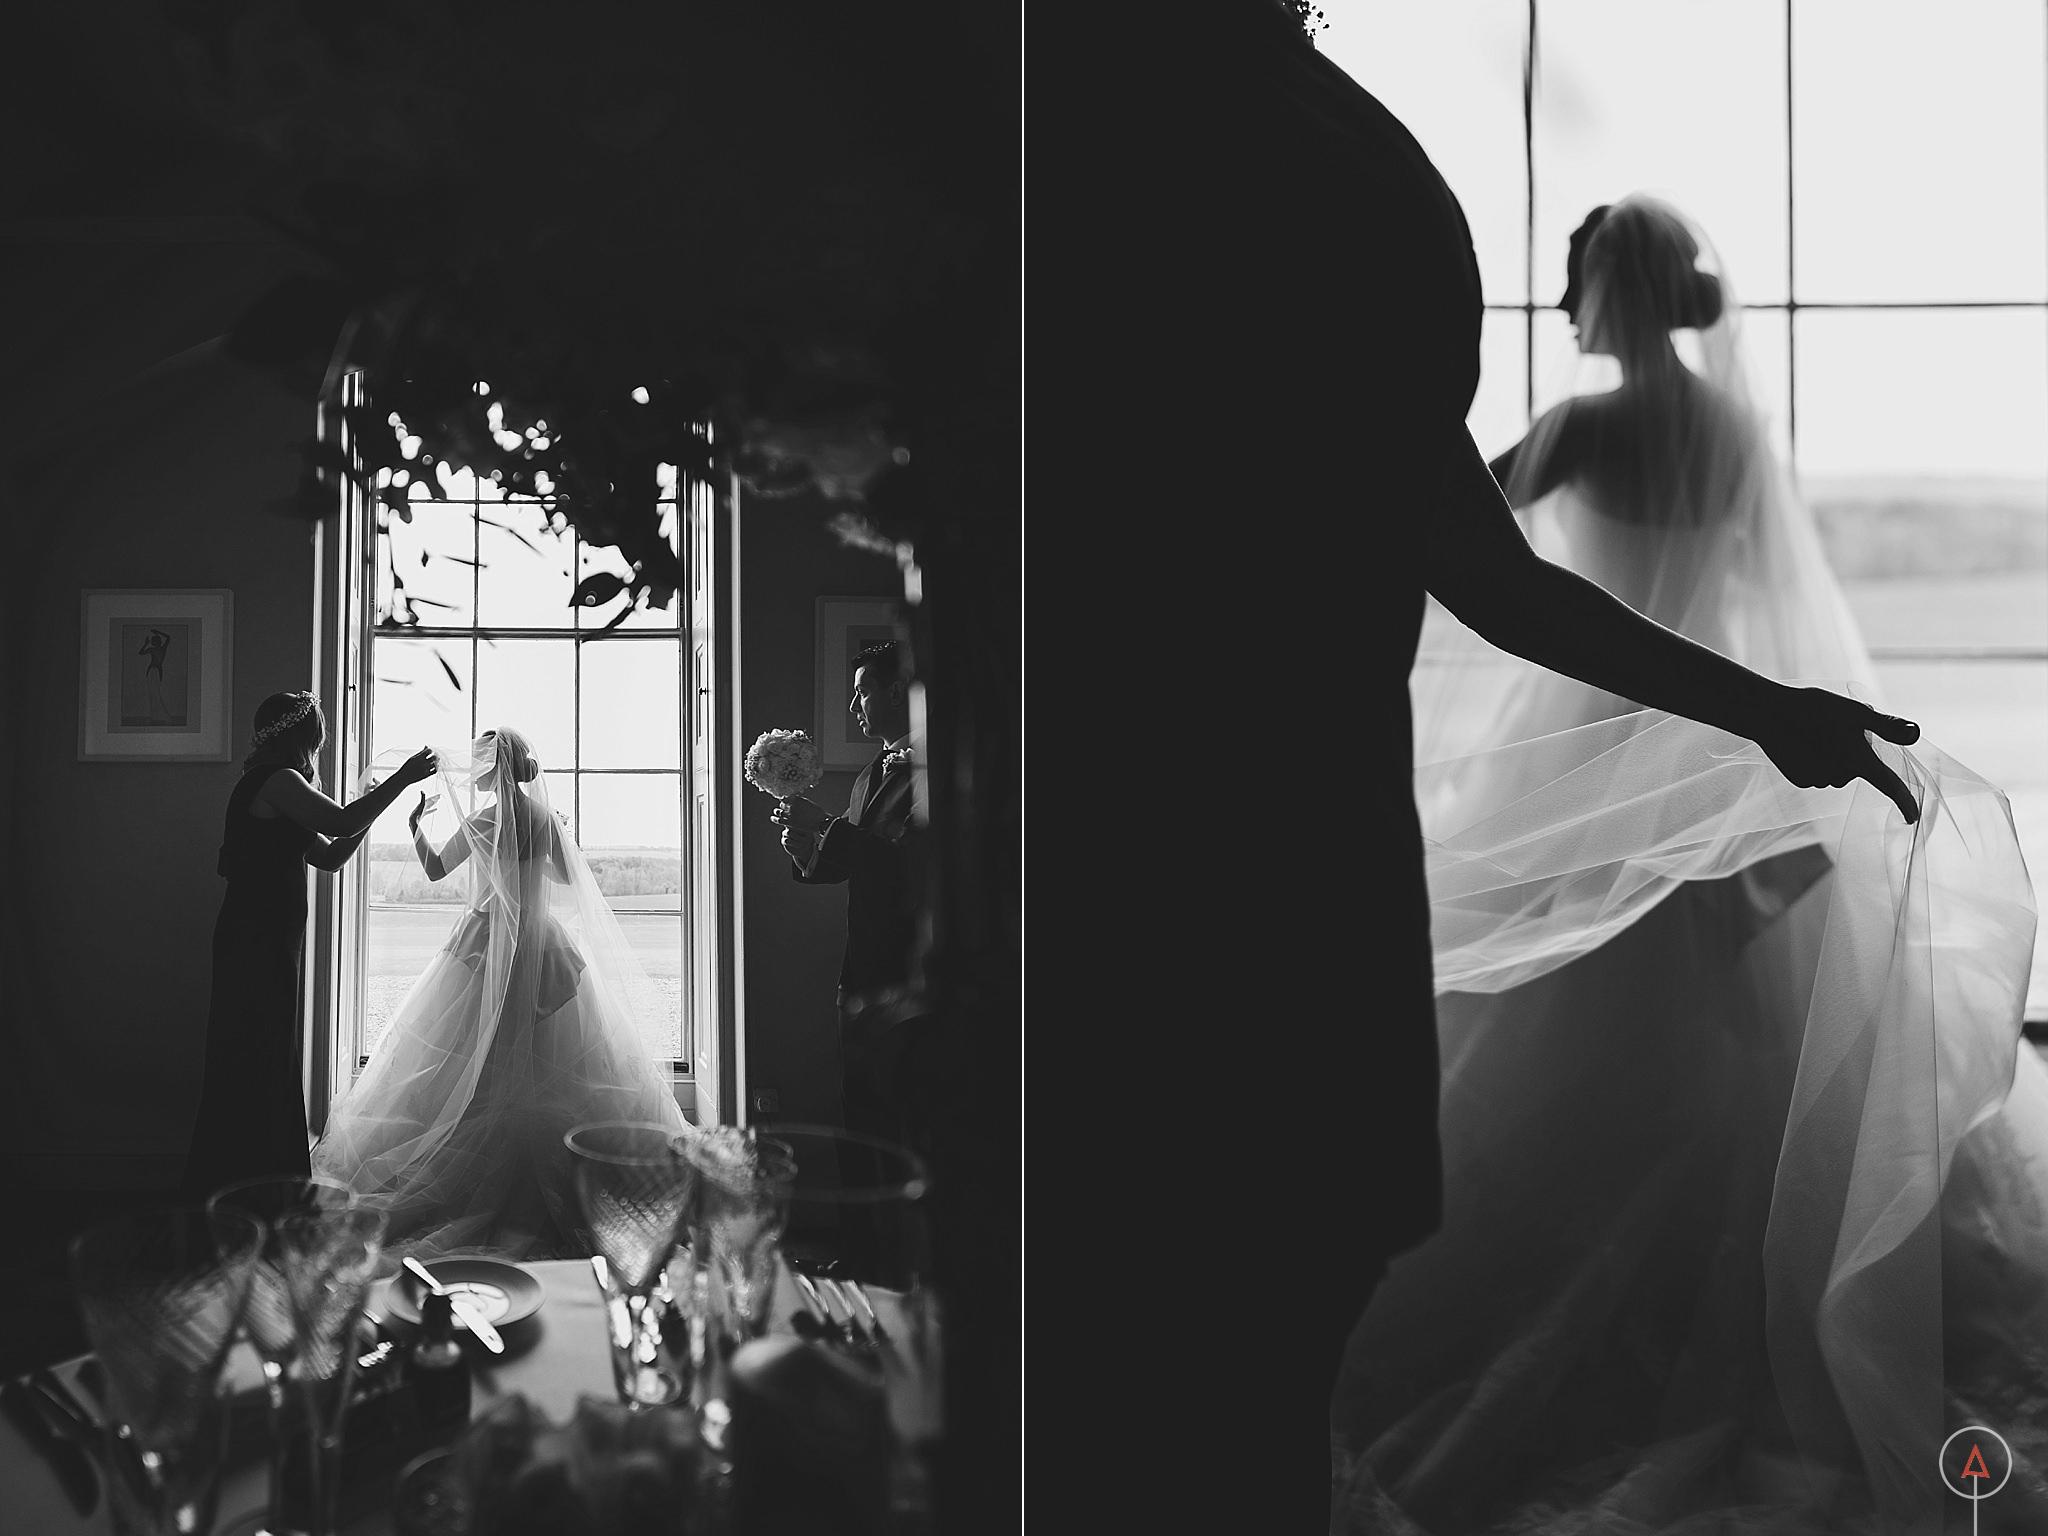 cardiff-wedding-photographer-aga-tomaszek_0201